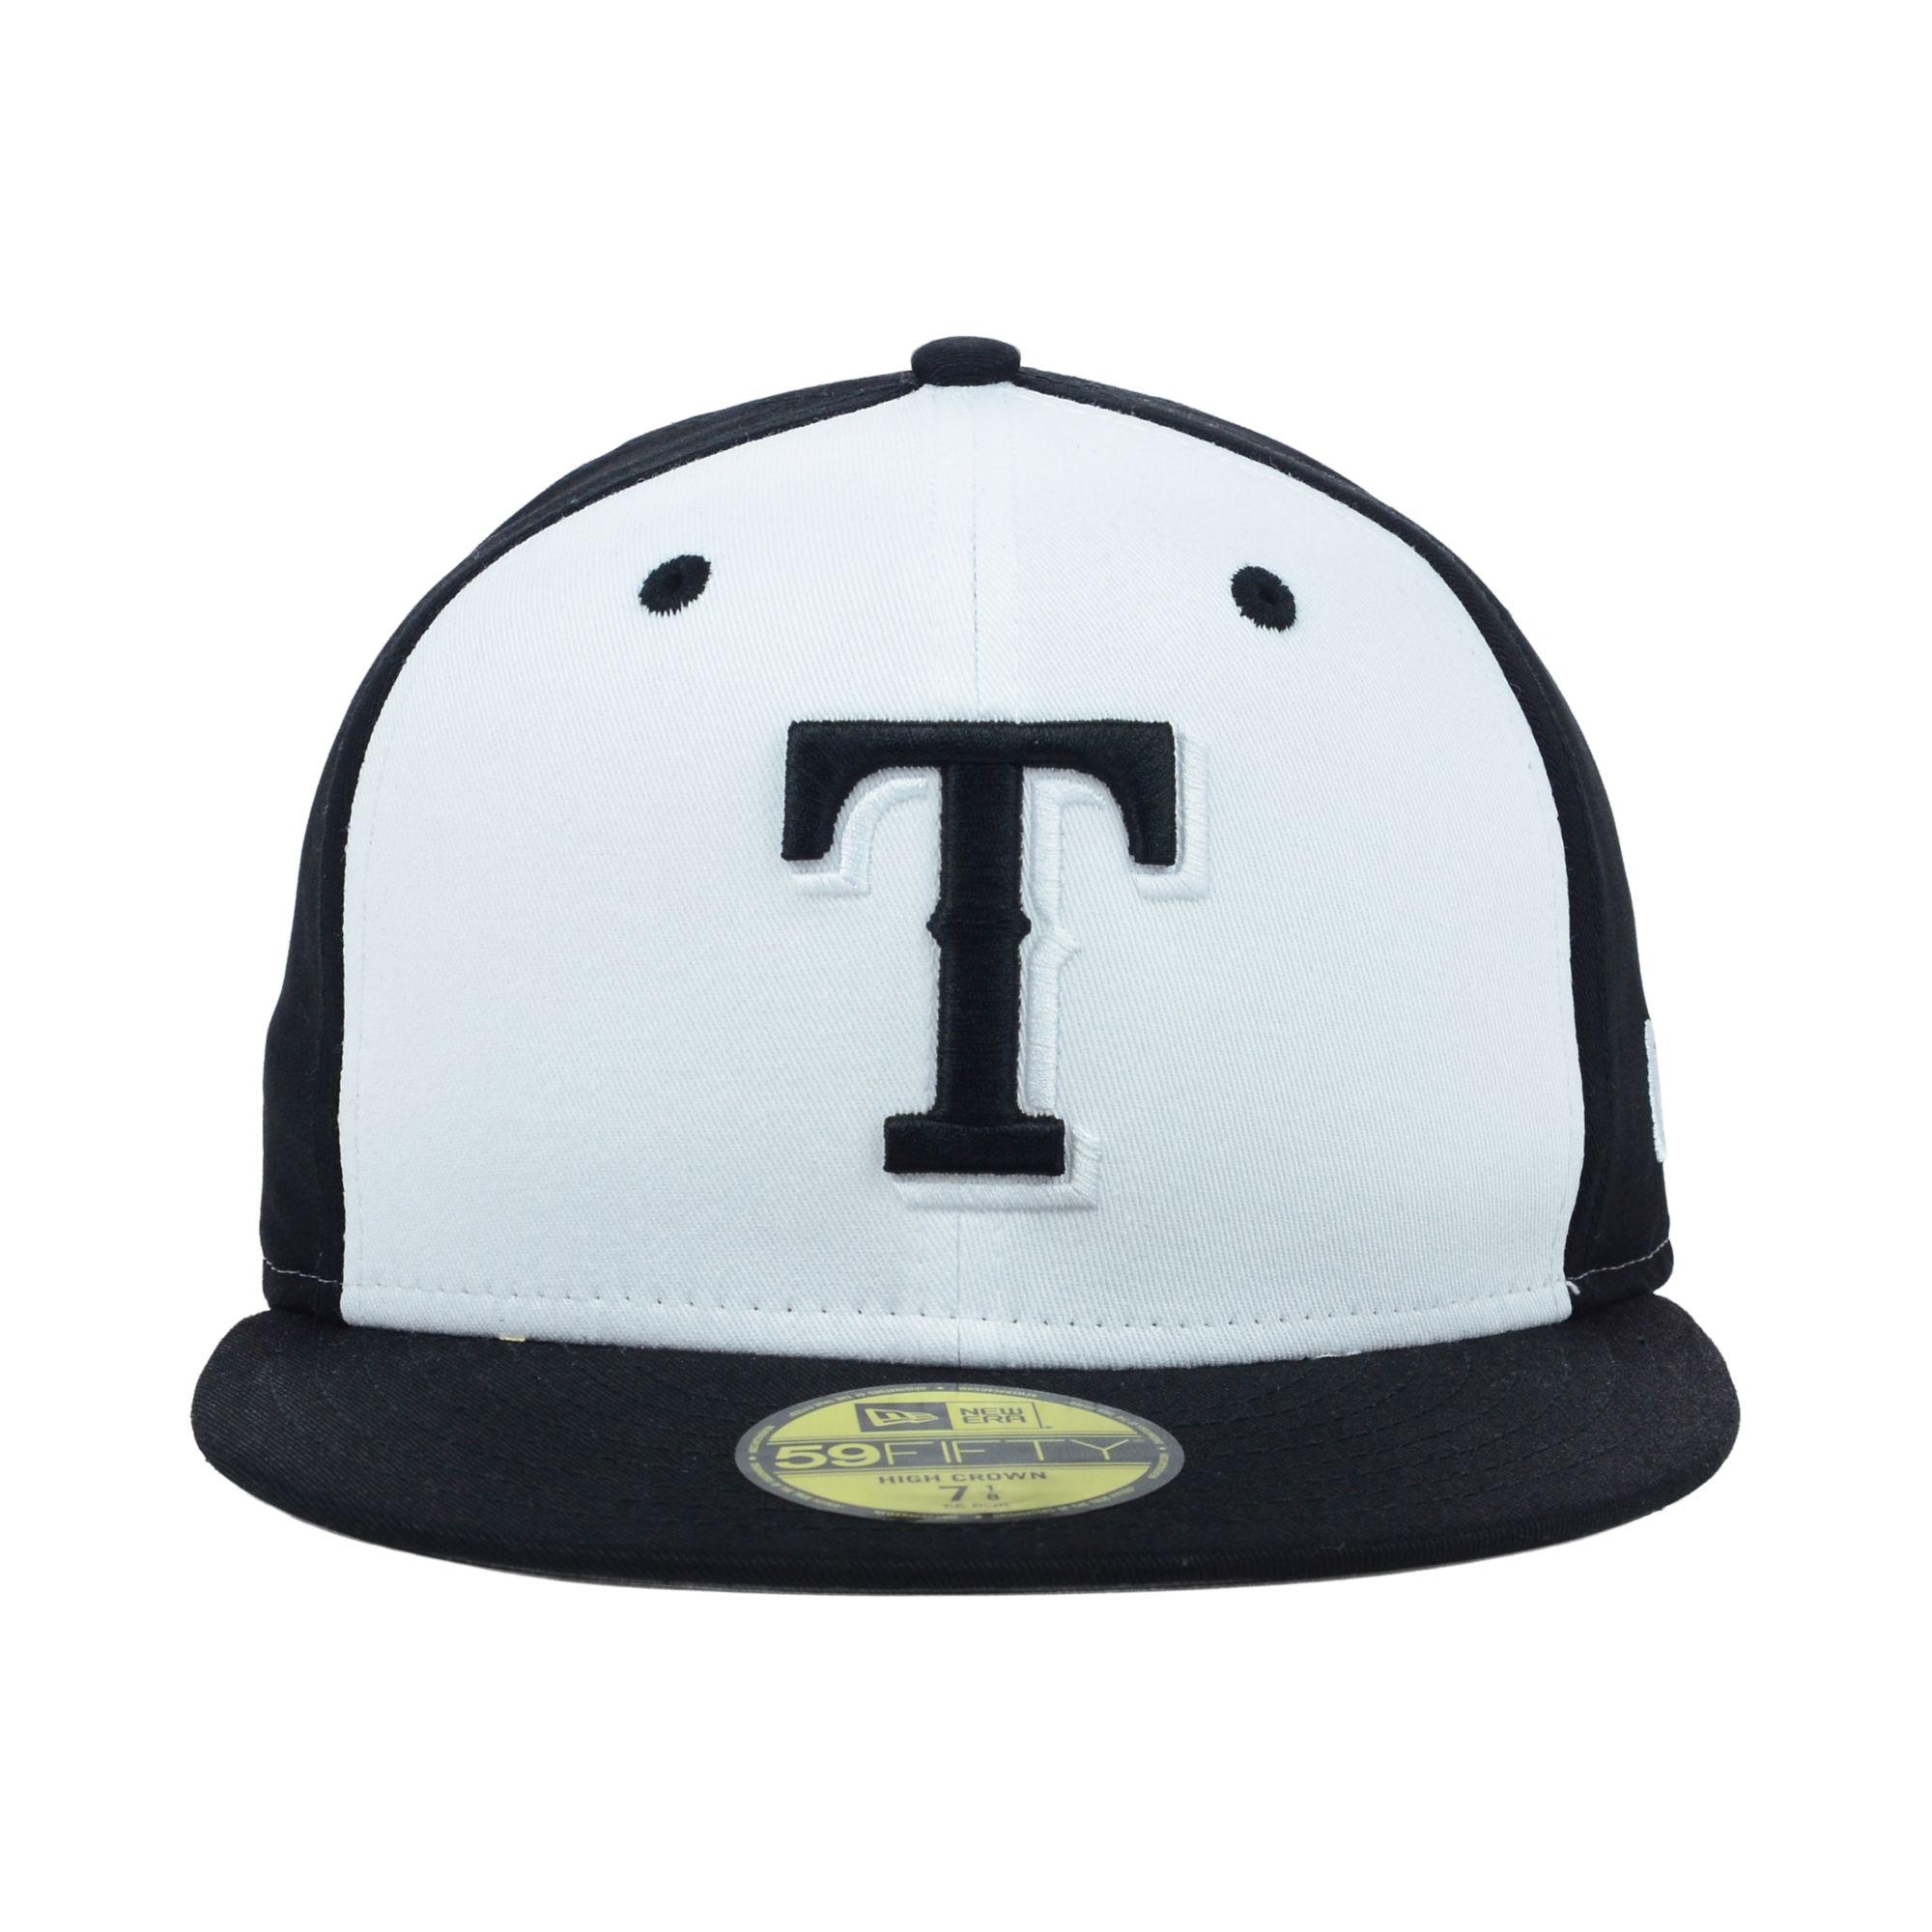 buy online fd7d6 12e3c KTZ Texas Rangers Mlb High Heat 59fifty Cap in Black for Men - Lyst